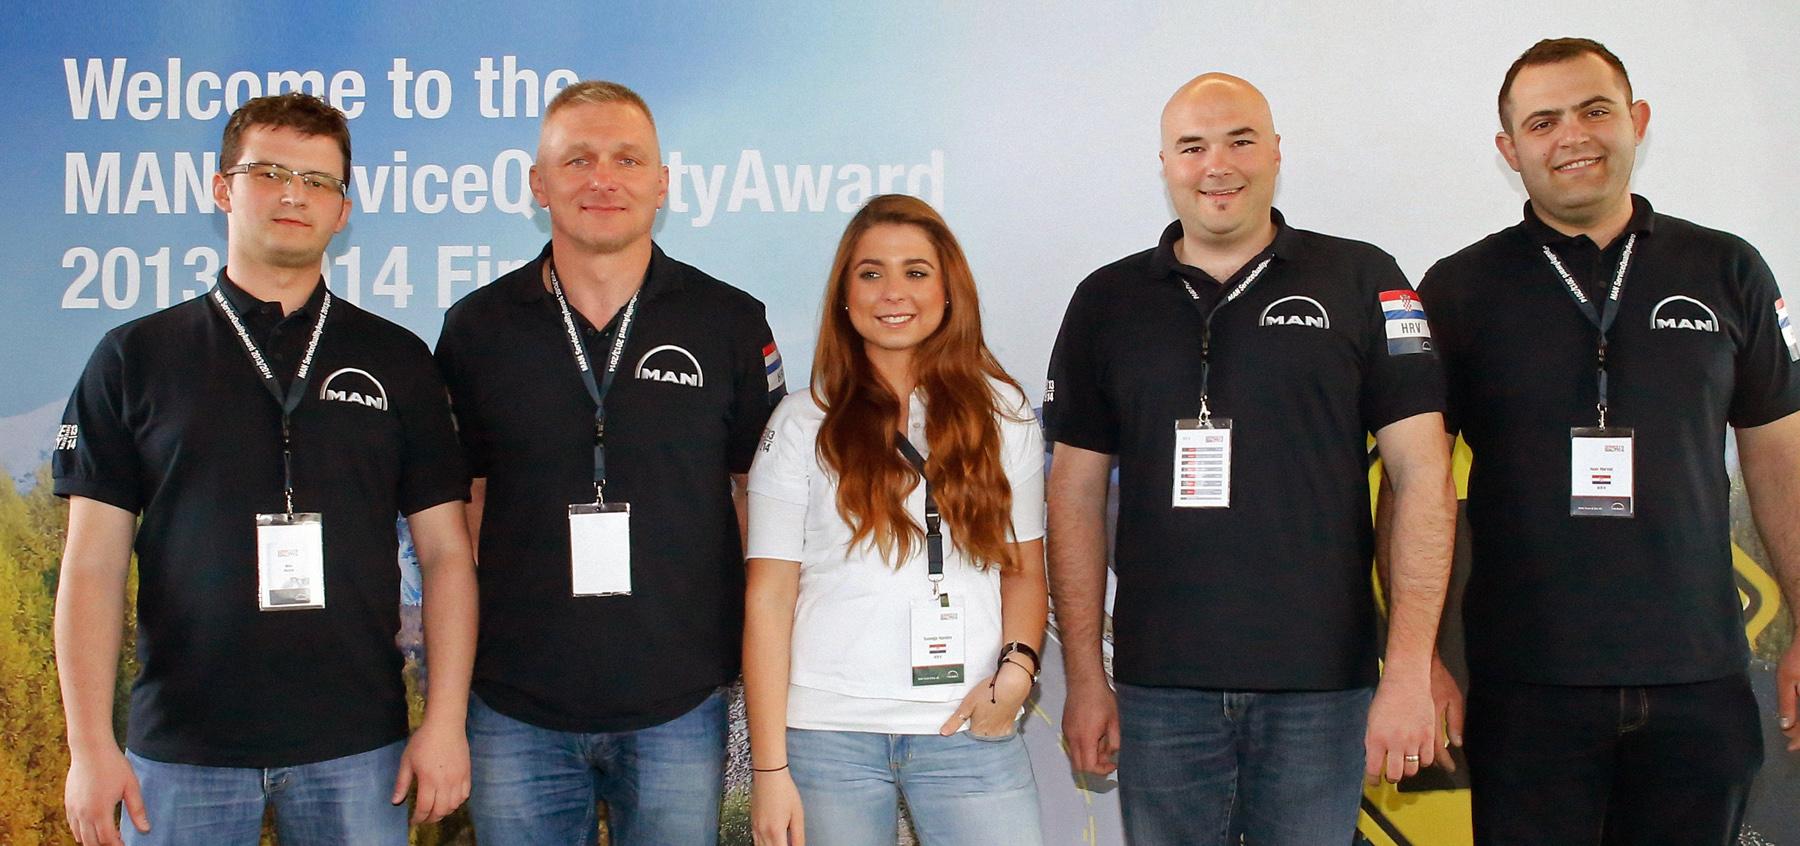 MAN Service Quality Award 2014 Winners